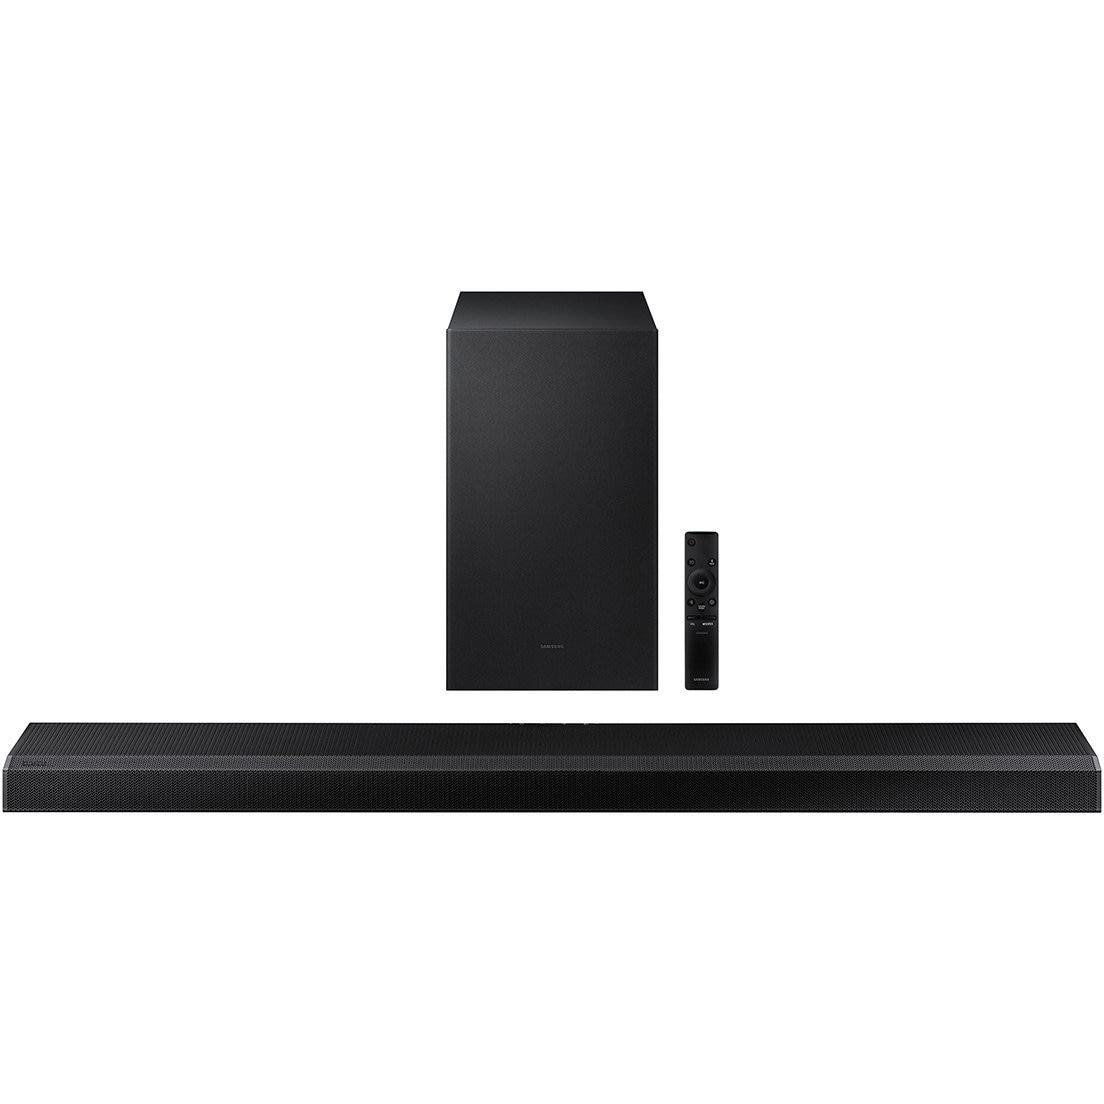 Fotografie Soundbar Samsung HW-Q700A, 3.1.2 Ch, 330W, Wireless Subwoofer, Dolby Atmos, DTS:X, Wi-Fi, eARC, Tap Sound, Voice Assistant